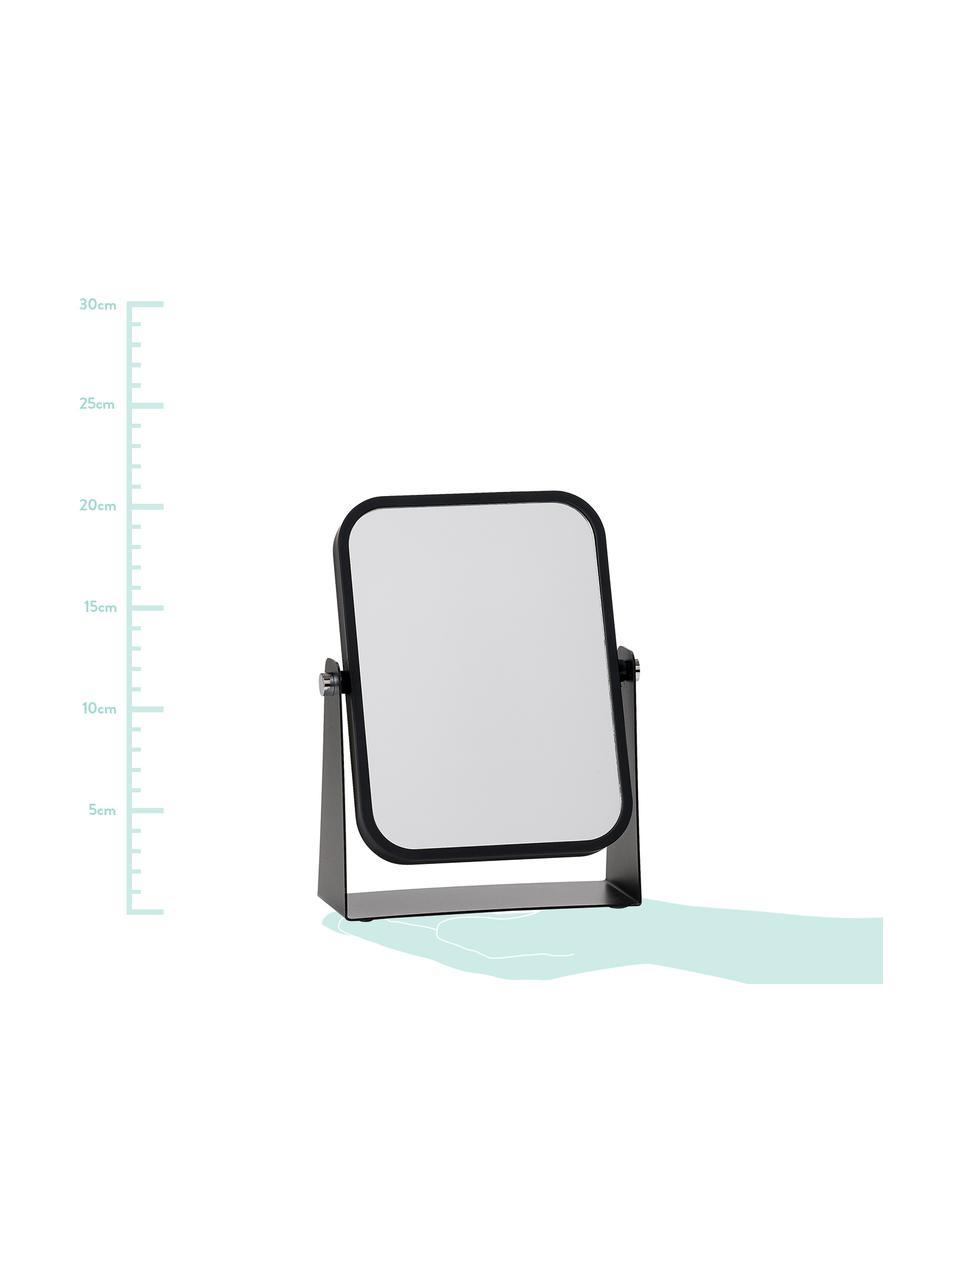 Kosmetické zrcadlo Aurora se zvětšením, Rám: černá Plocha zrcadla: zrcadlo